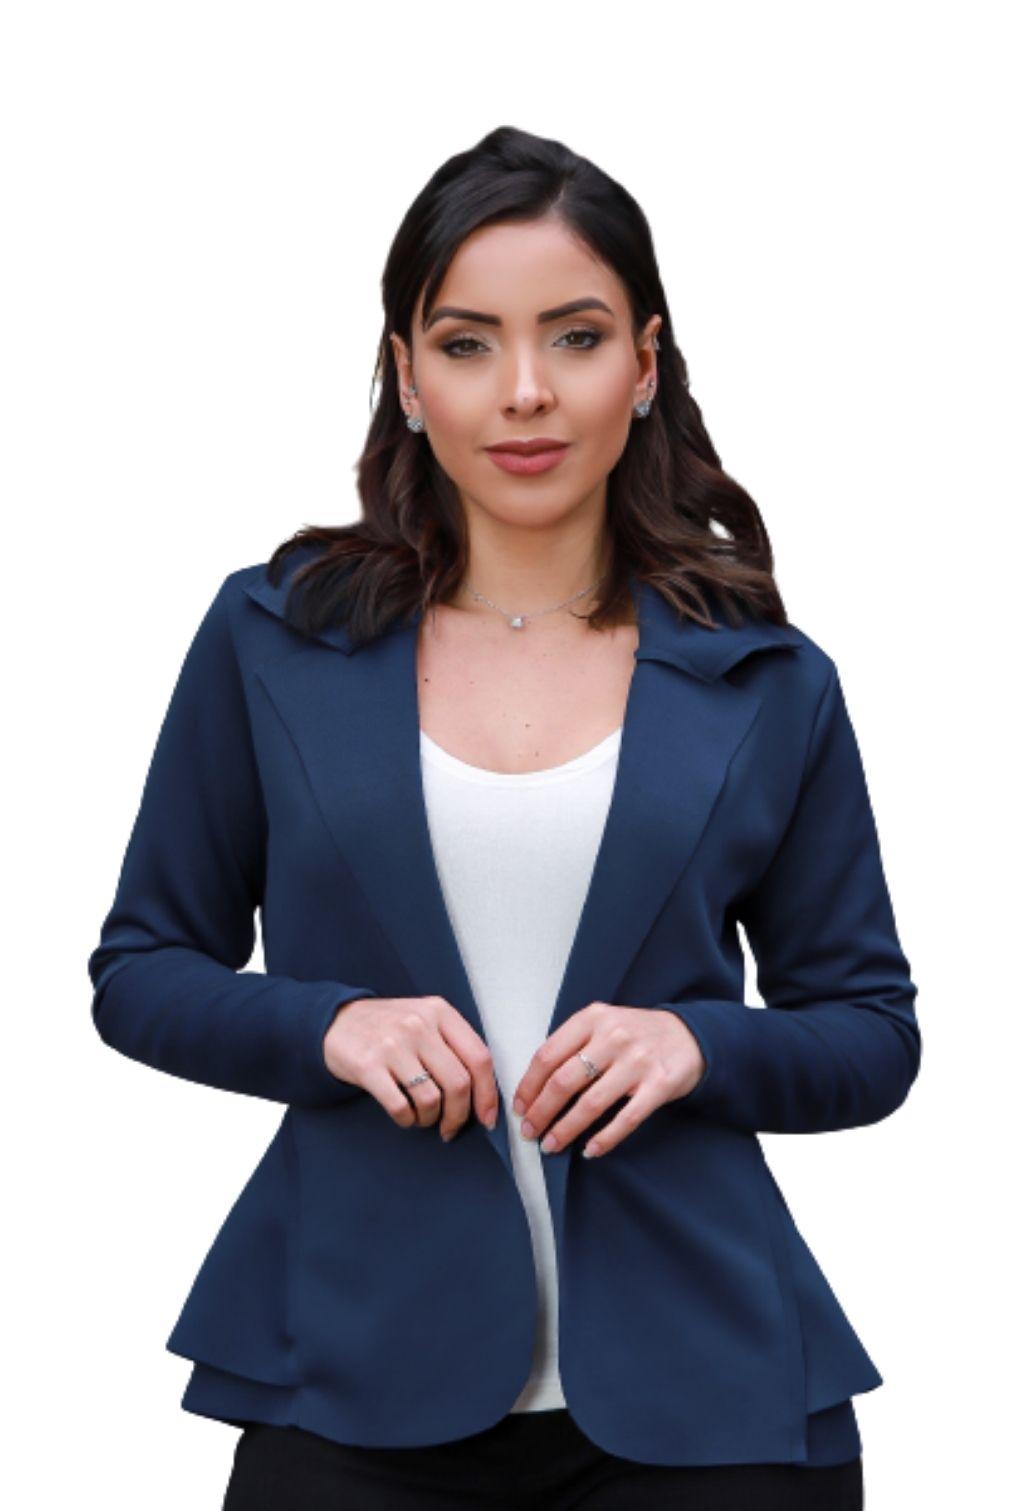 Blazer Casaquinho Neoprene Feminino Terninho Azul Marinho  - ModaStore   Moda Feminina